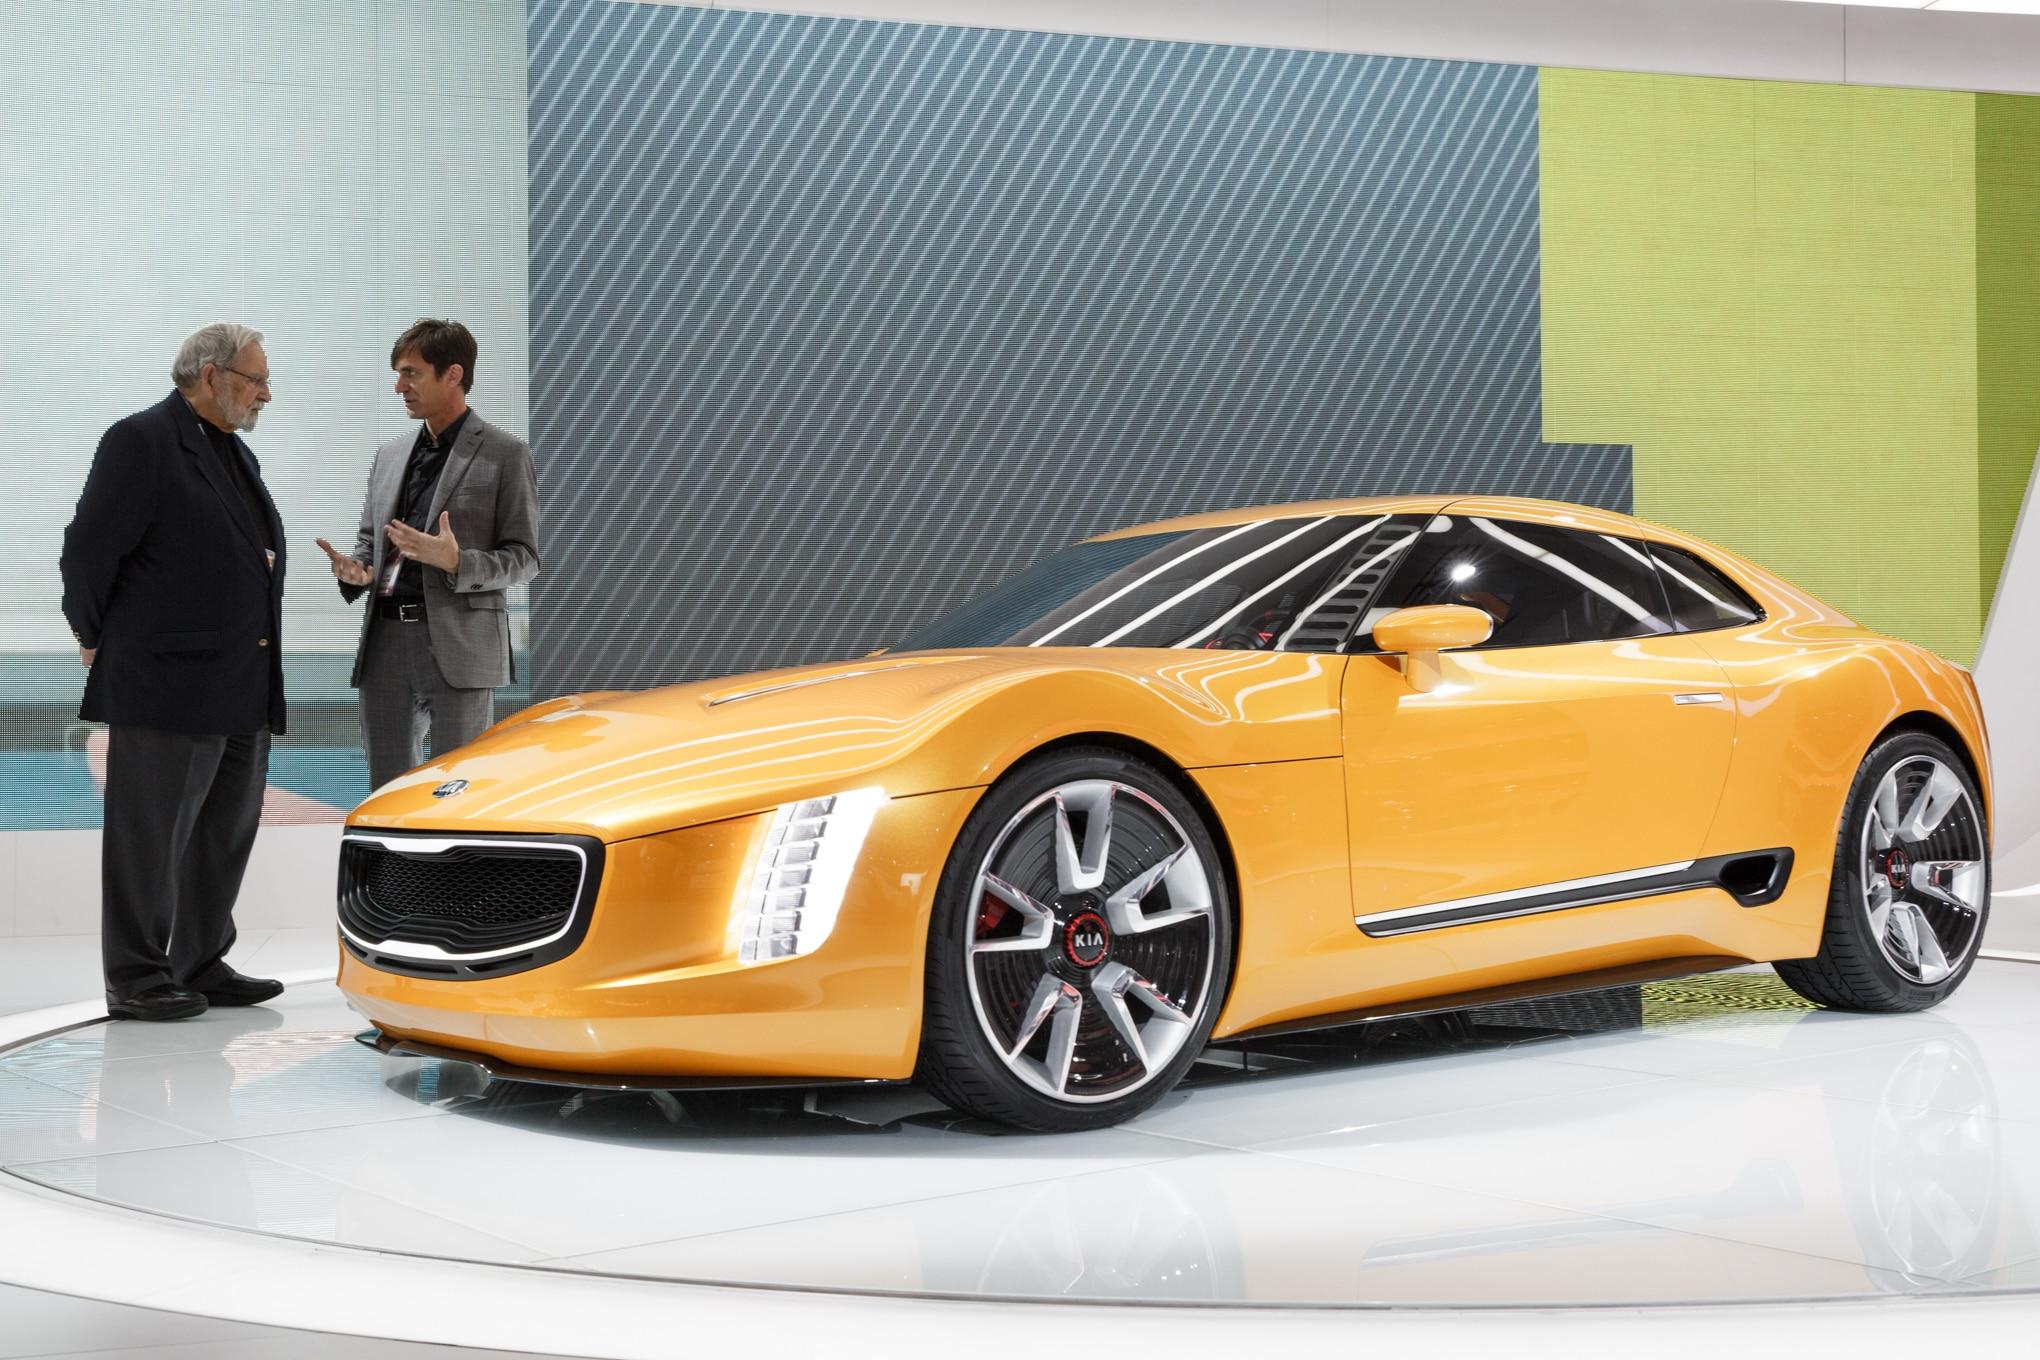 2014 Detroit Auto Show Robert Cumberford Interview With Kia Patrick M Hoey Automobile Magazine 12